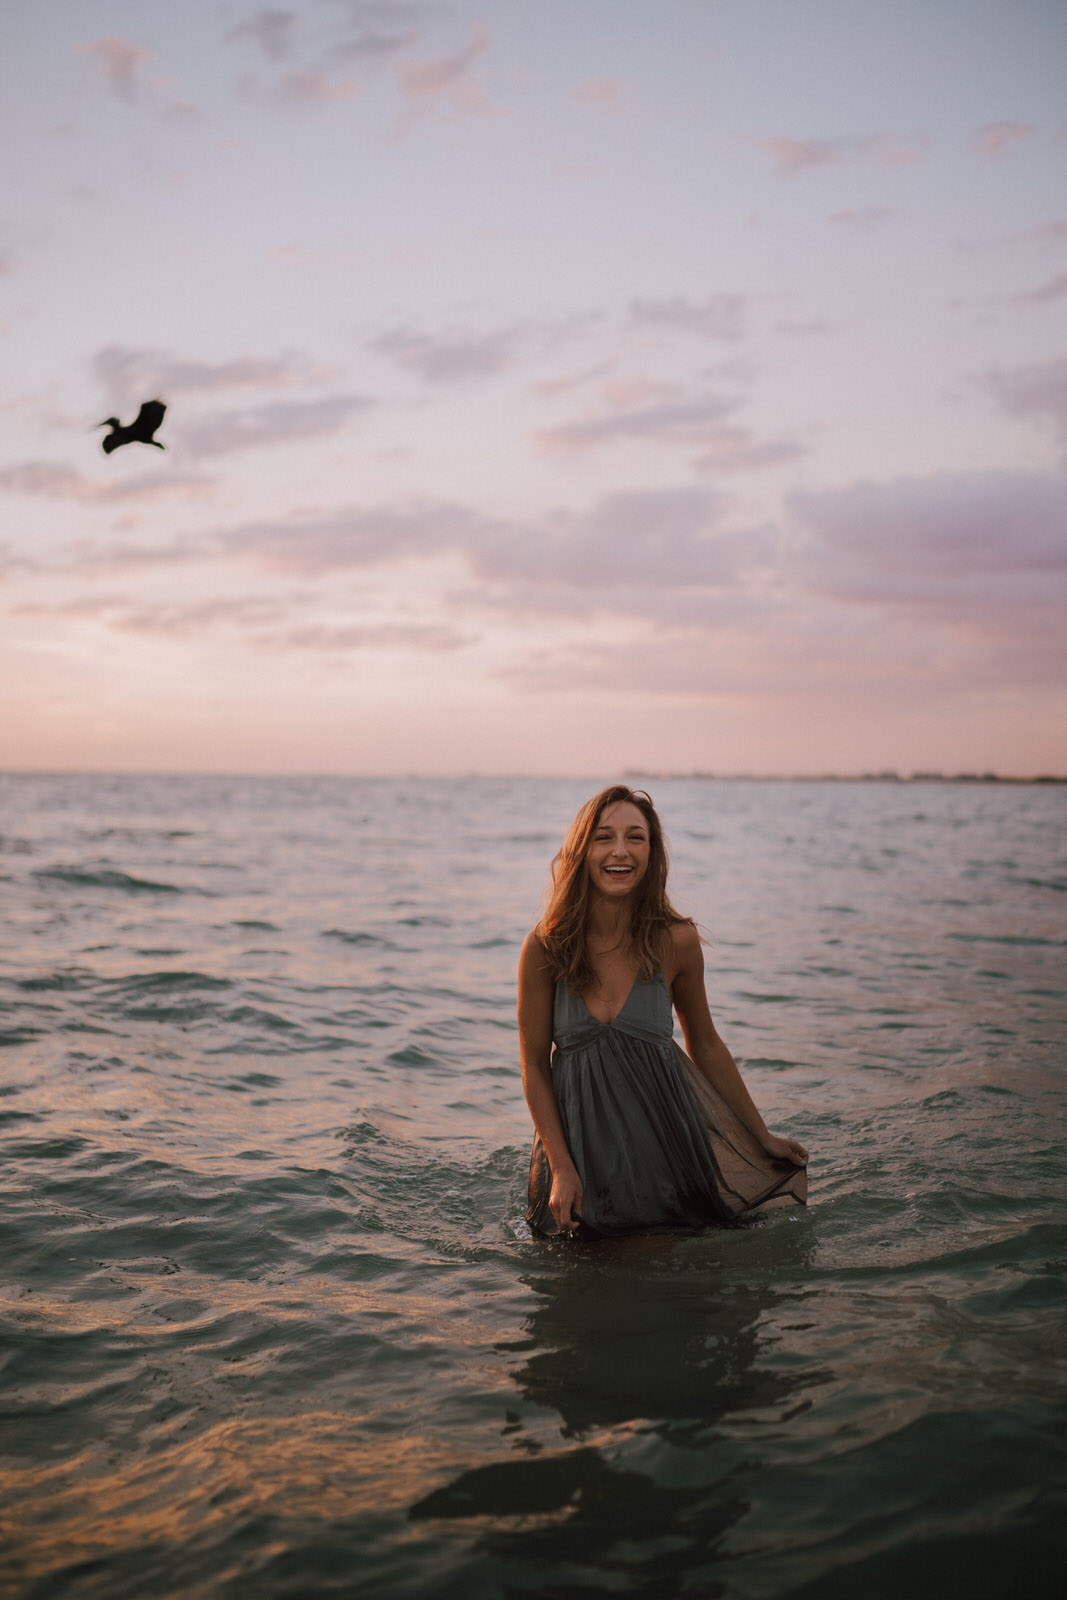 Fort Myers Senior Photos on Bonita Beach - Michelle Gonzalez Photography - Sammie-183.JPG